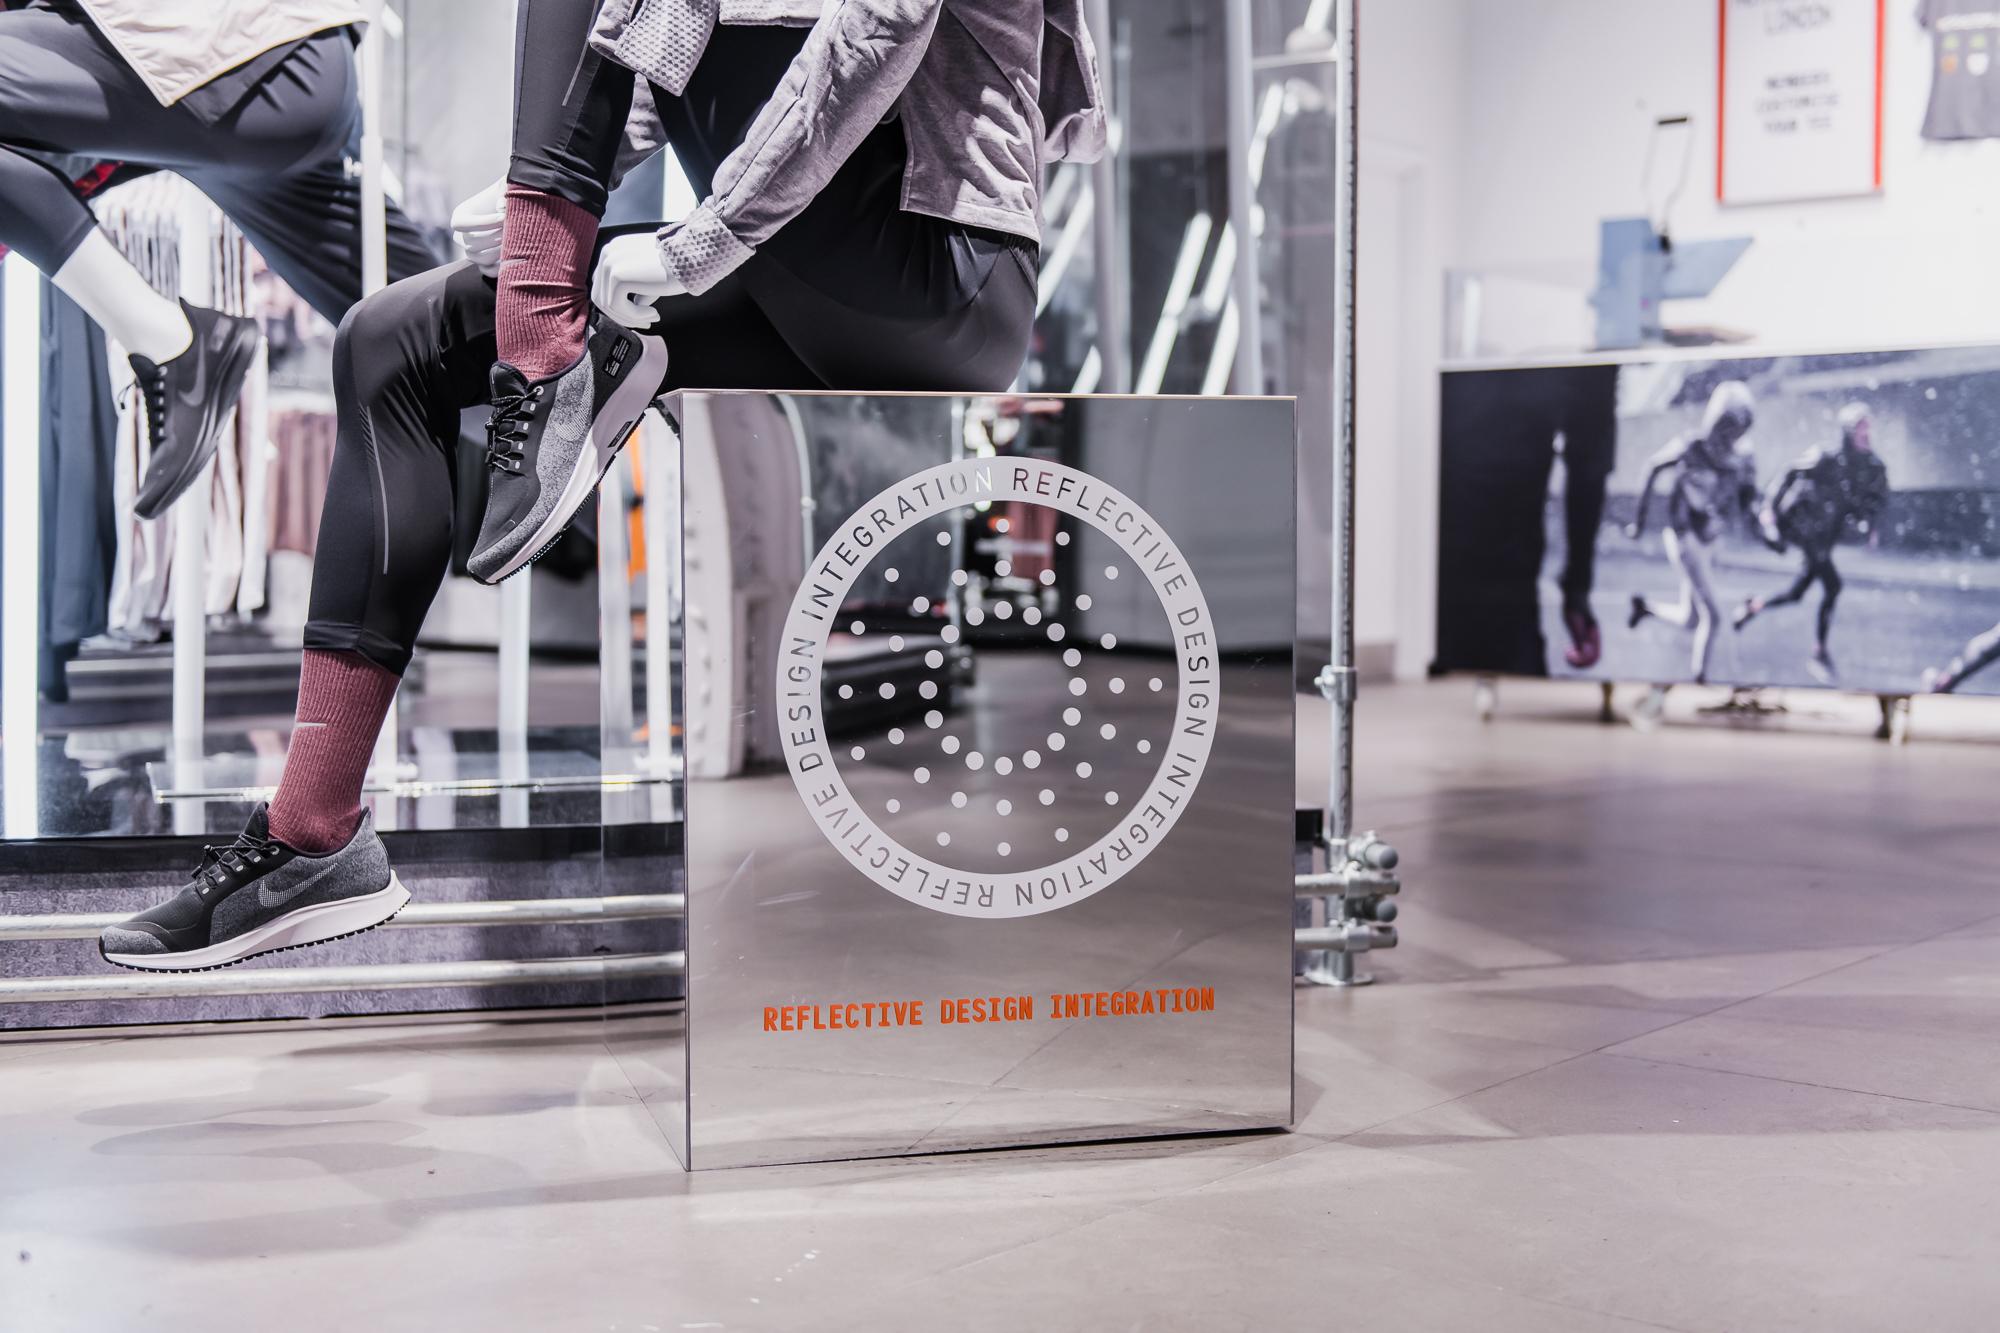 _DSC5444 - Nike - Utility - UPDATE - Flash Recap - NTL - Tom D Morgan - WEB.jpg